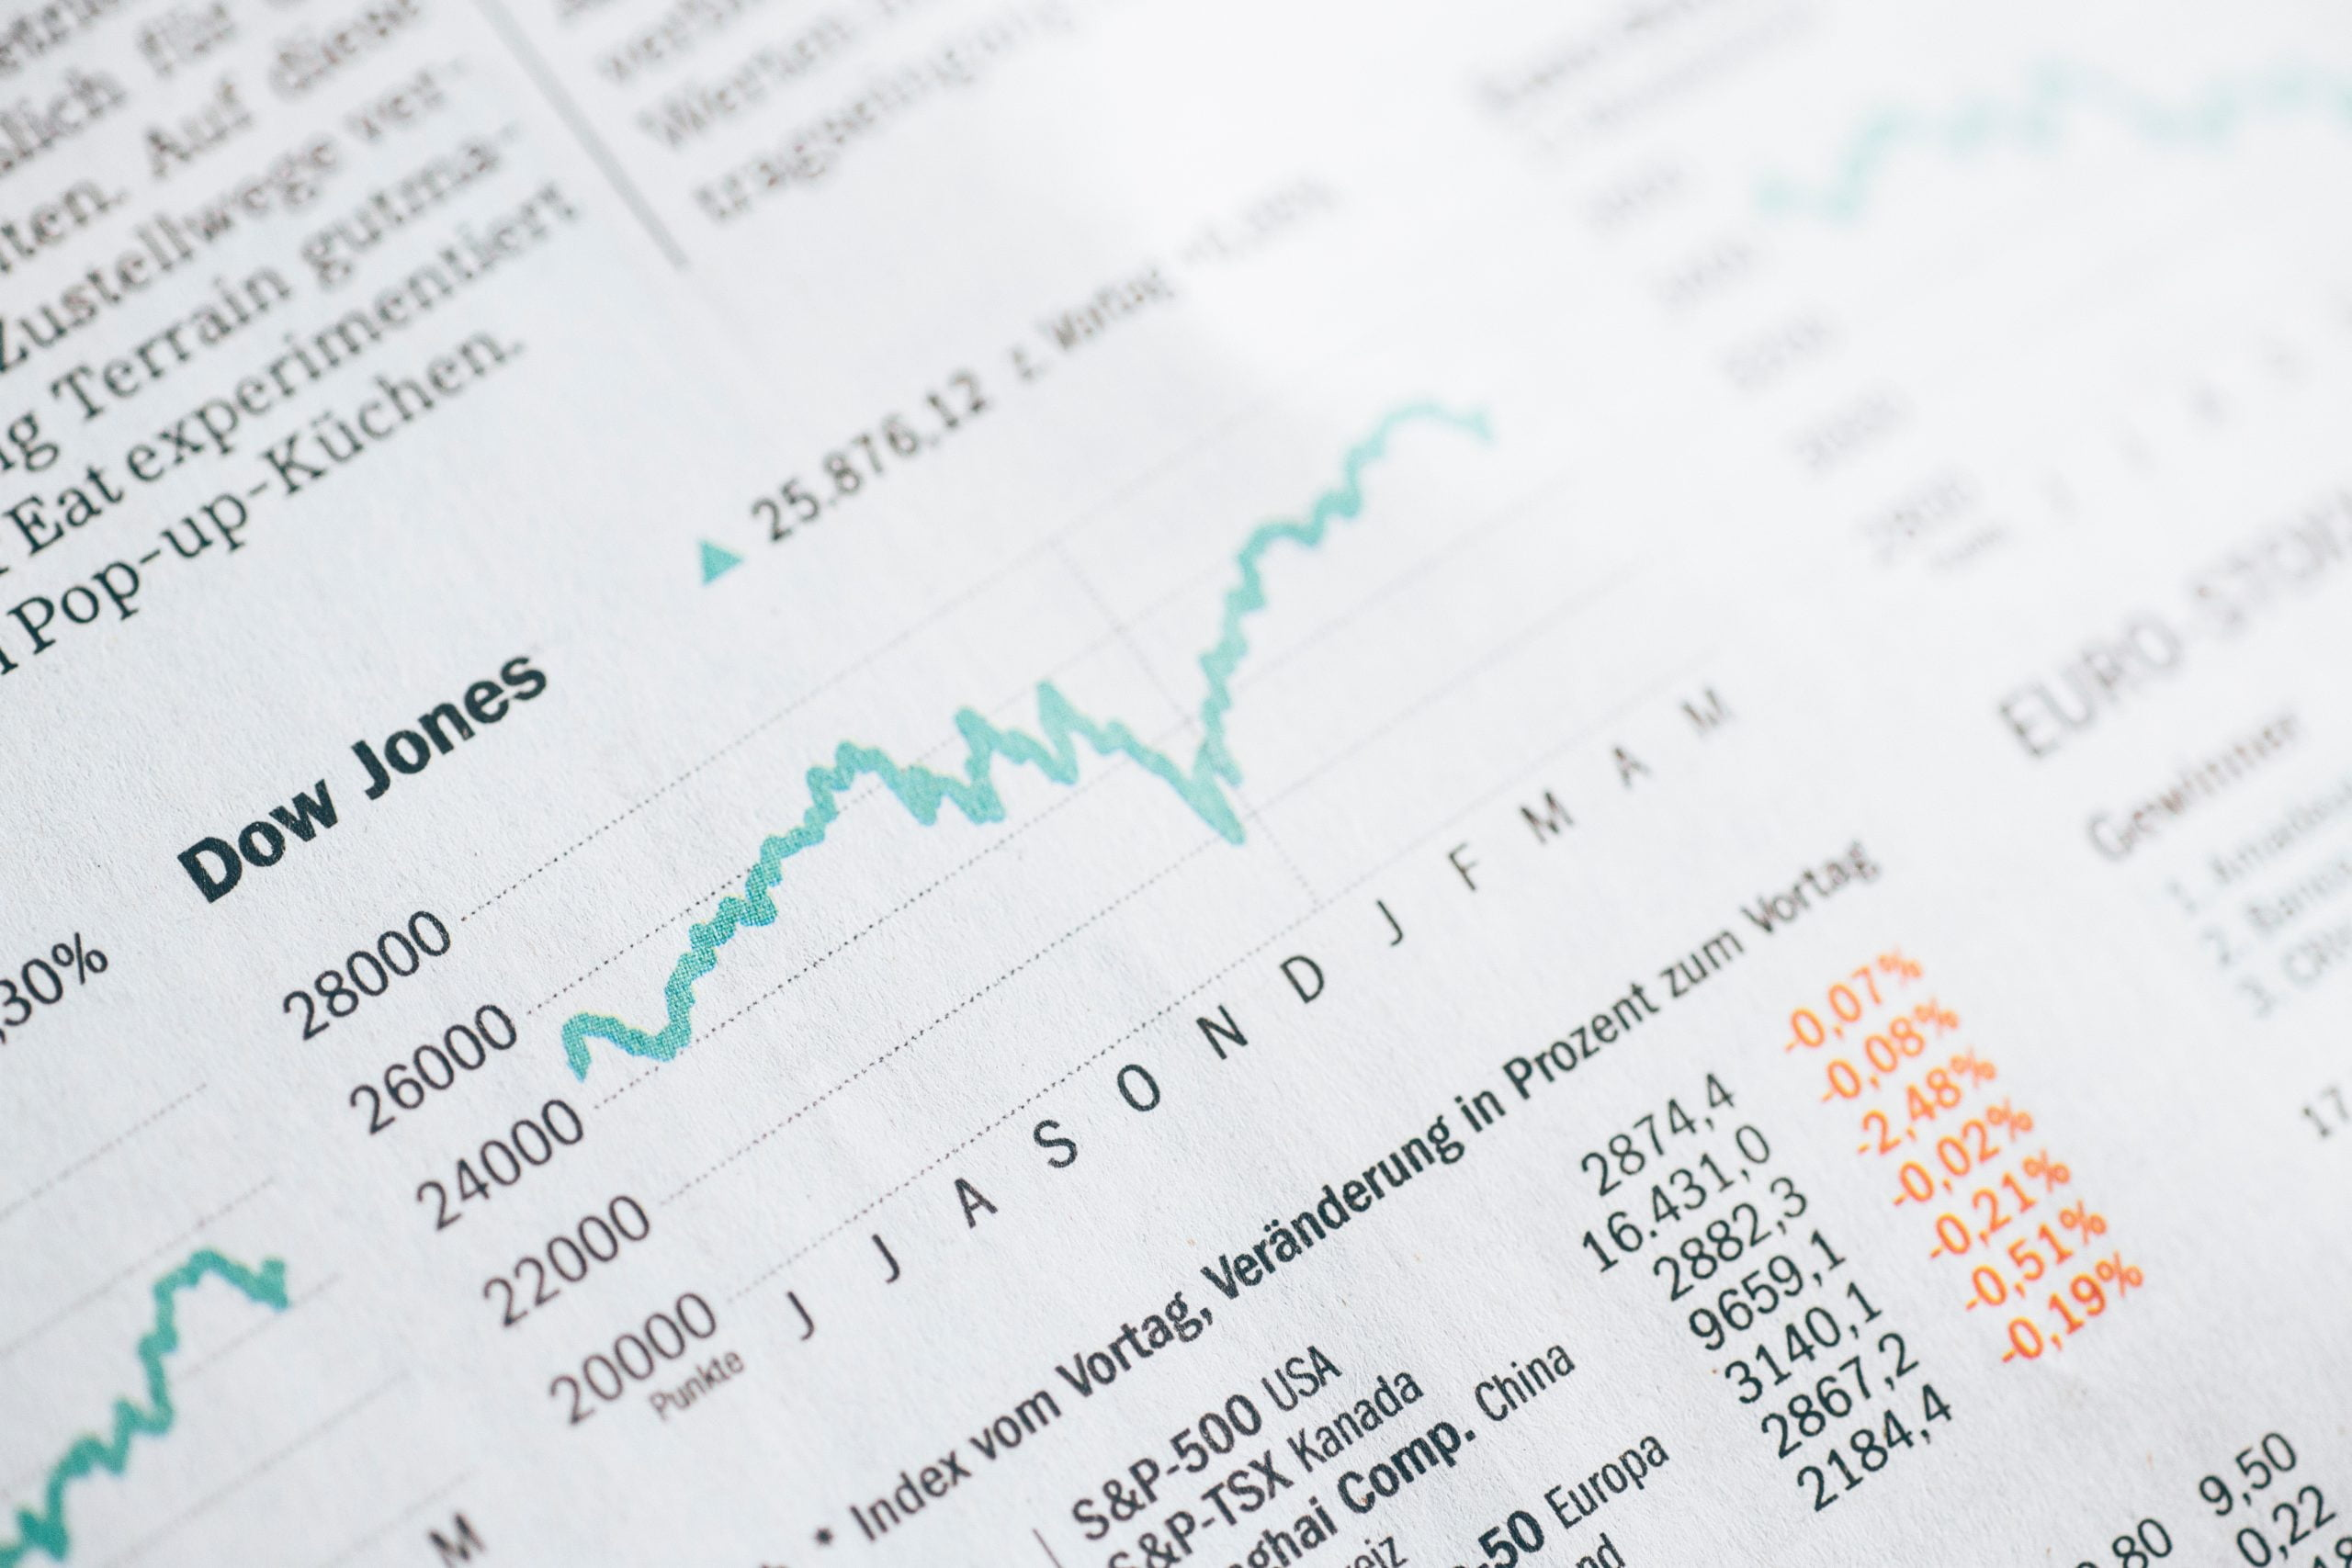 bitcoin, btc usd, bitcoin price, bitcoin volatility, xbtusd. btcusdt